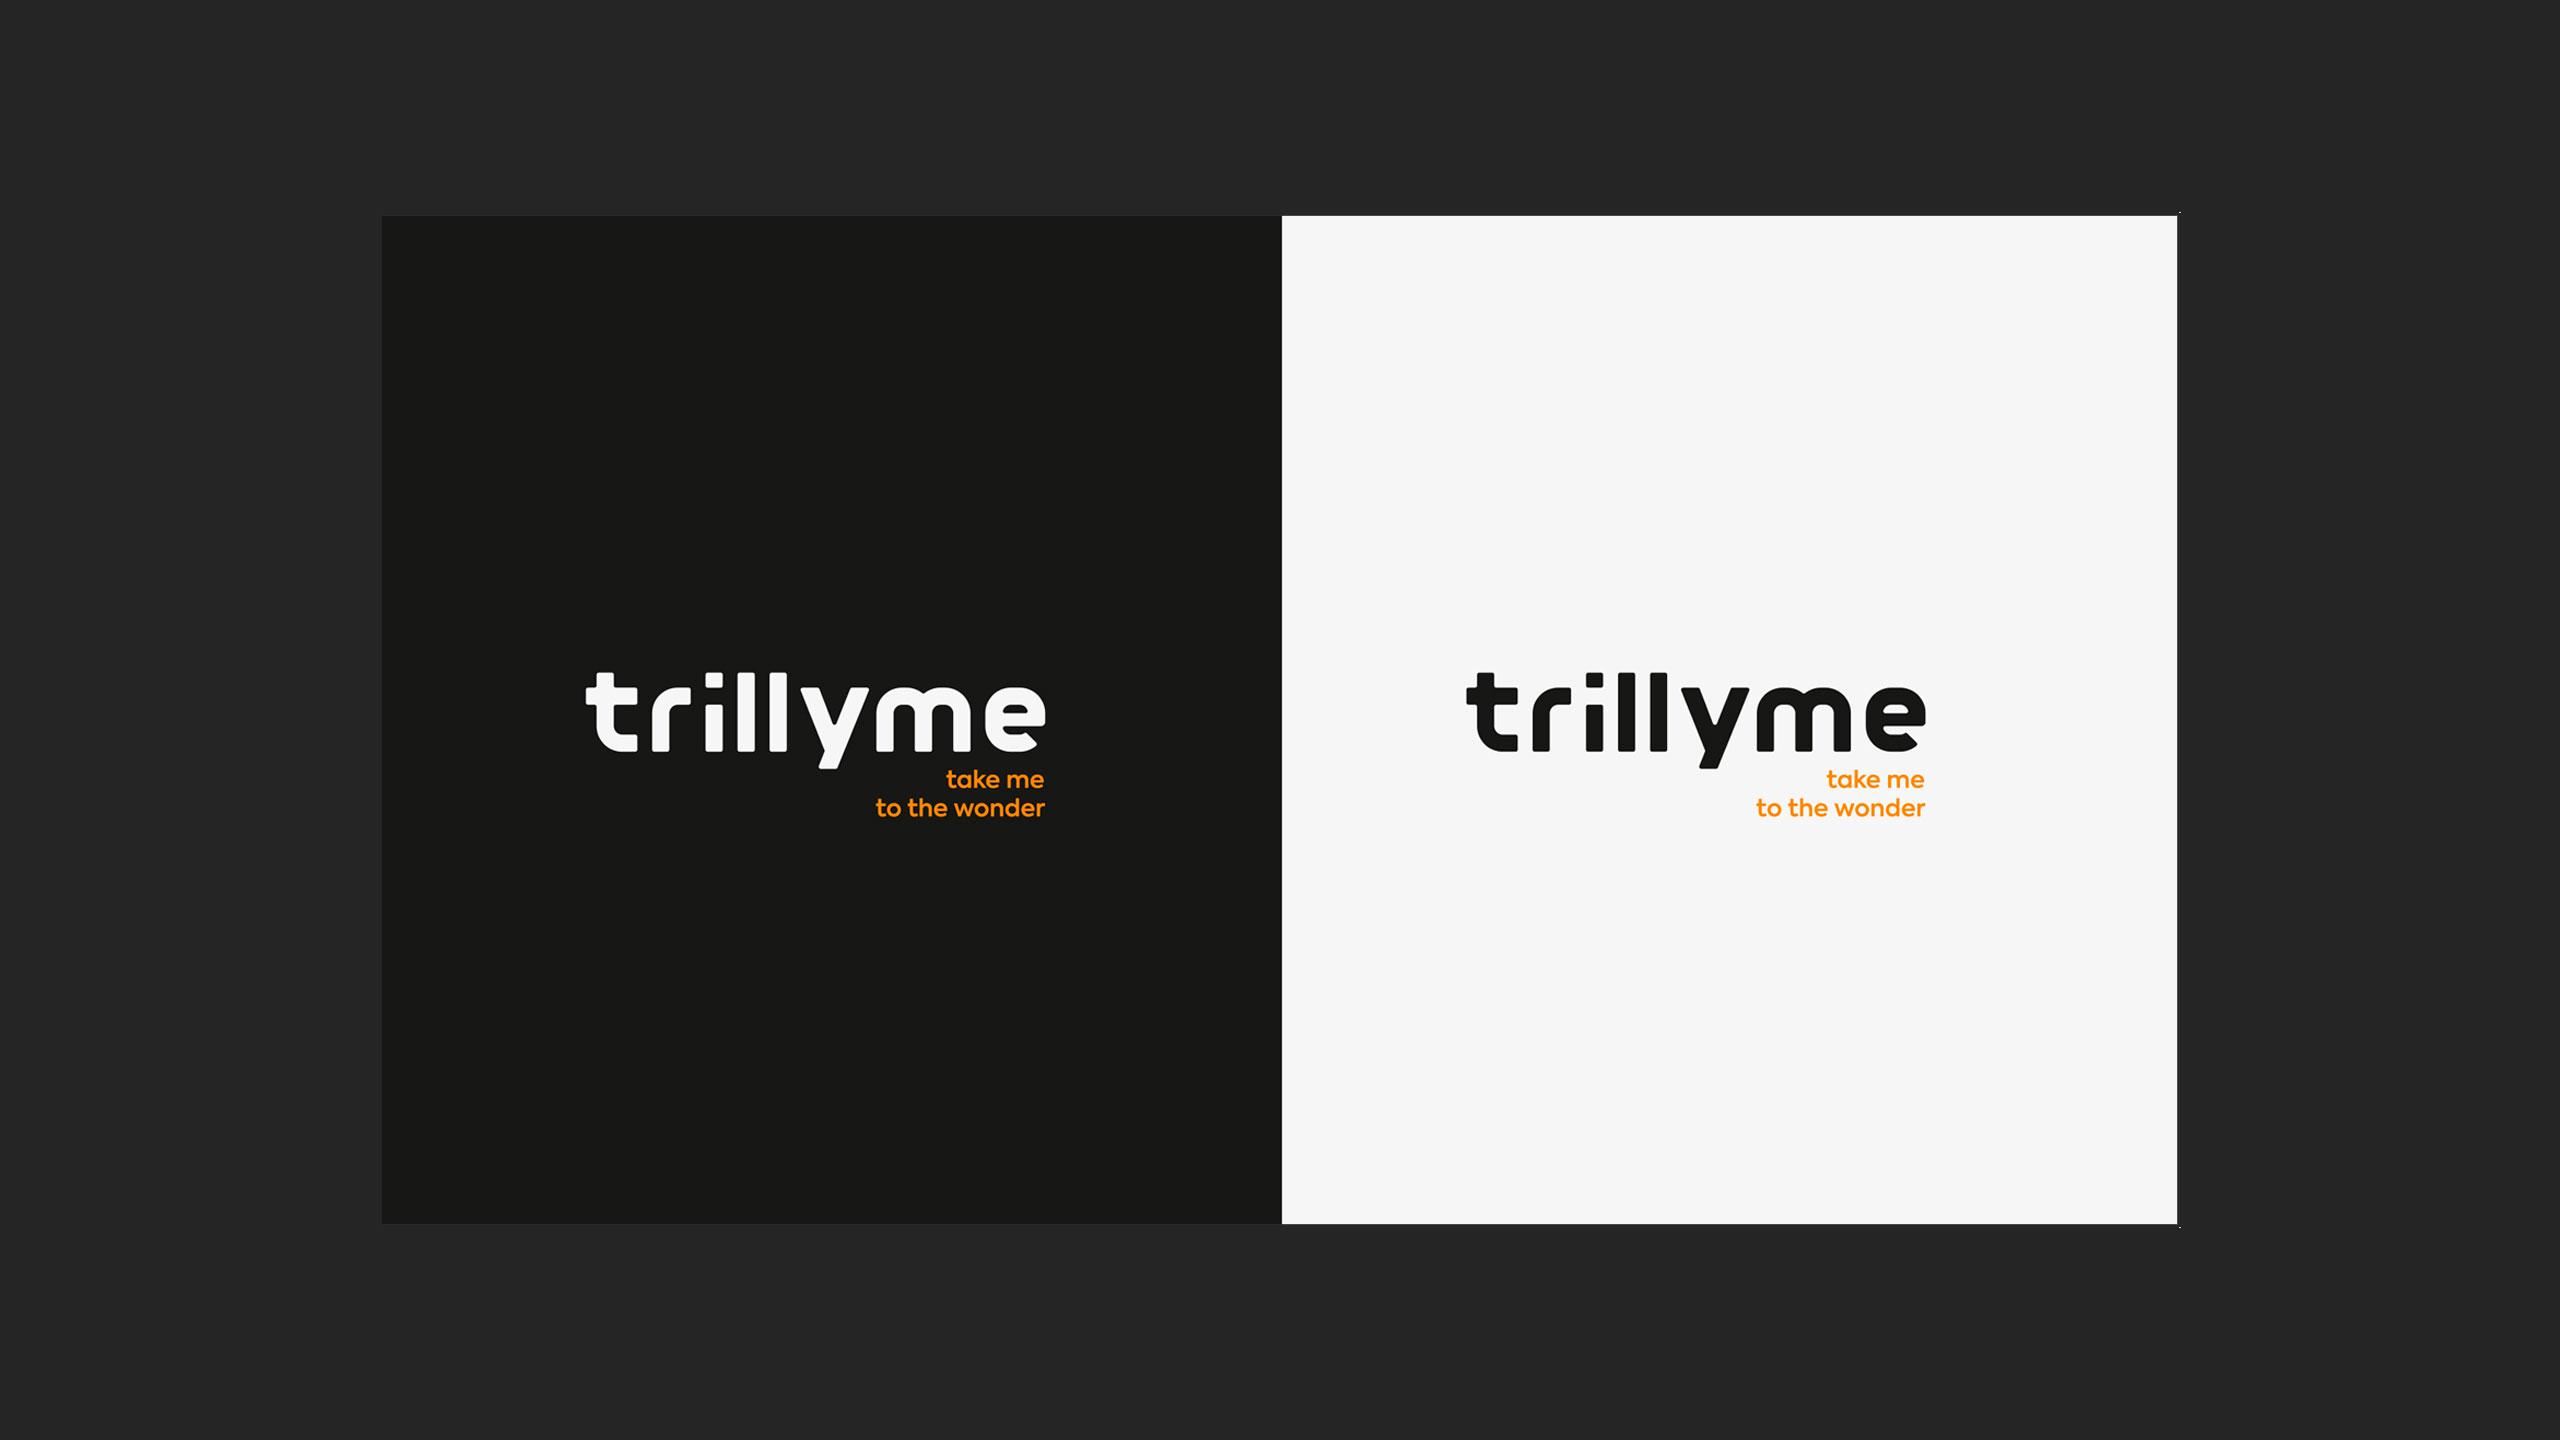 Trilllyme